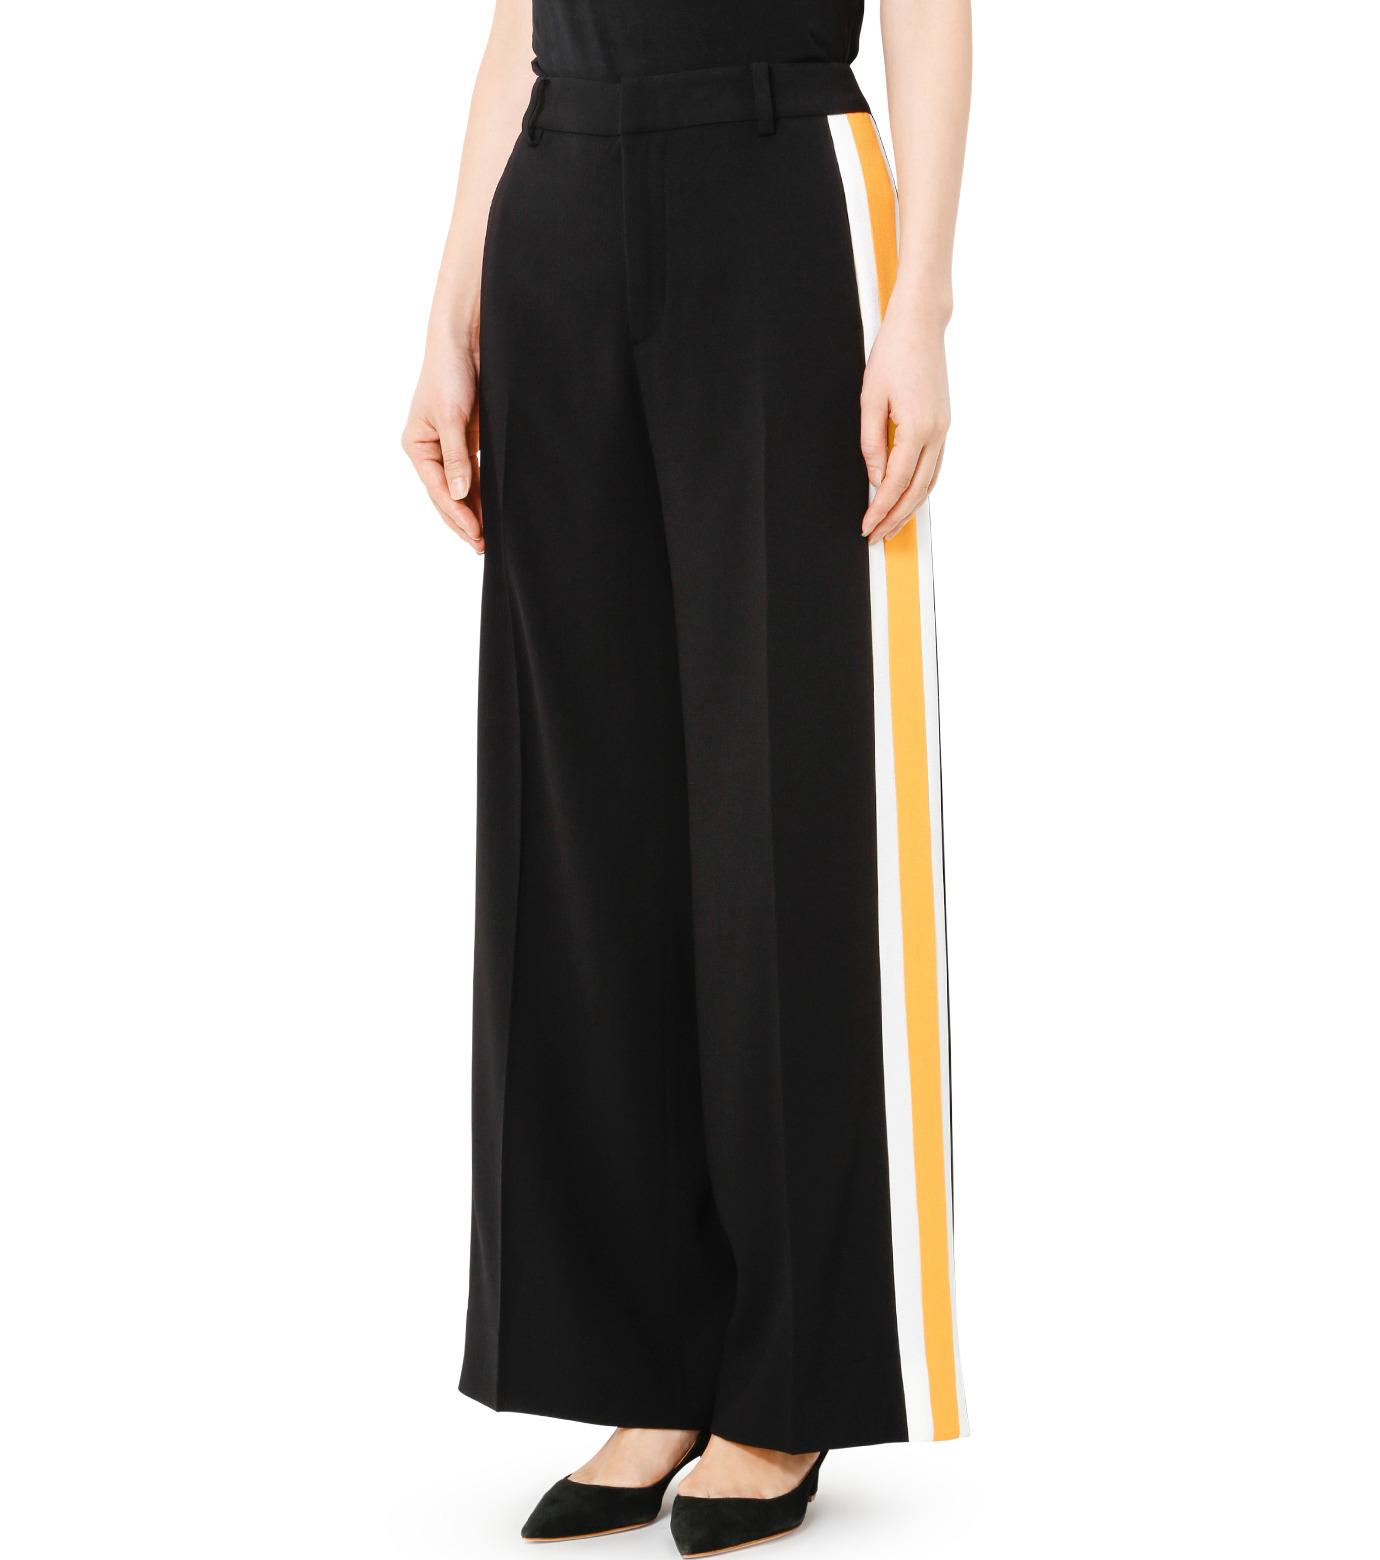 LE CIEL BLEU(ルシェルブルー)のトラックワイドパンツ-BLACK(パンツ/pants)-19S68103 拡大詳細画像3